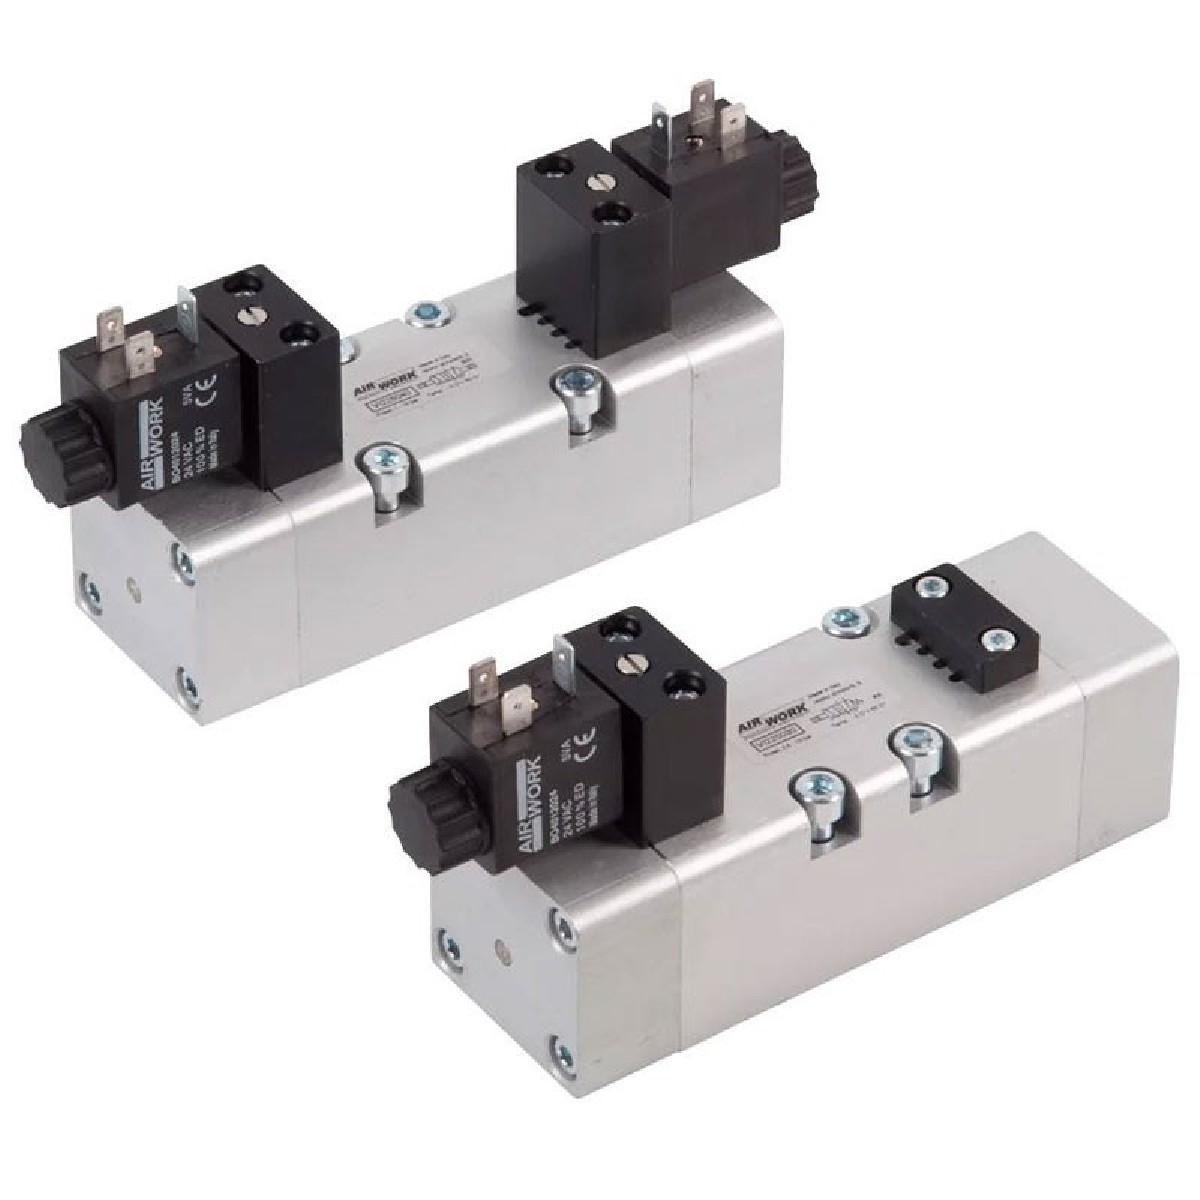 Davair Pneumatic Valves - ISO Valves 5599/1, VI Series